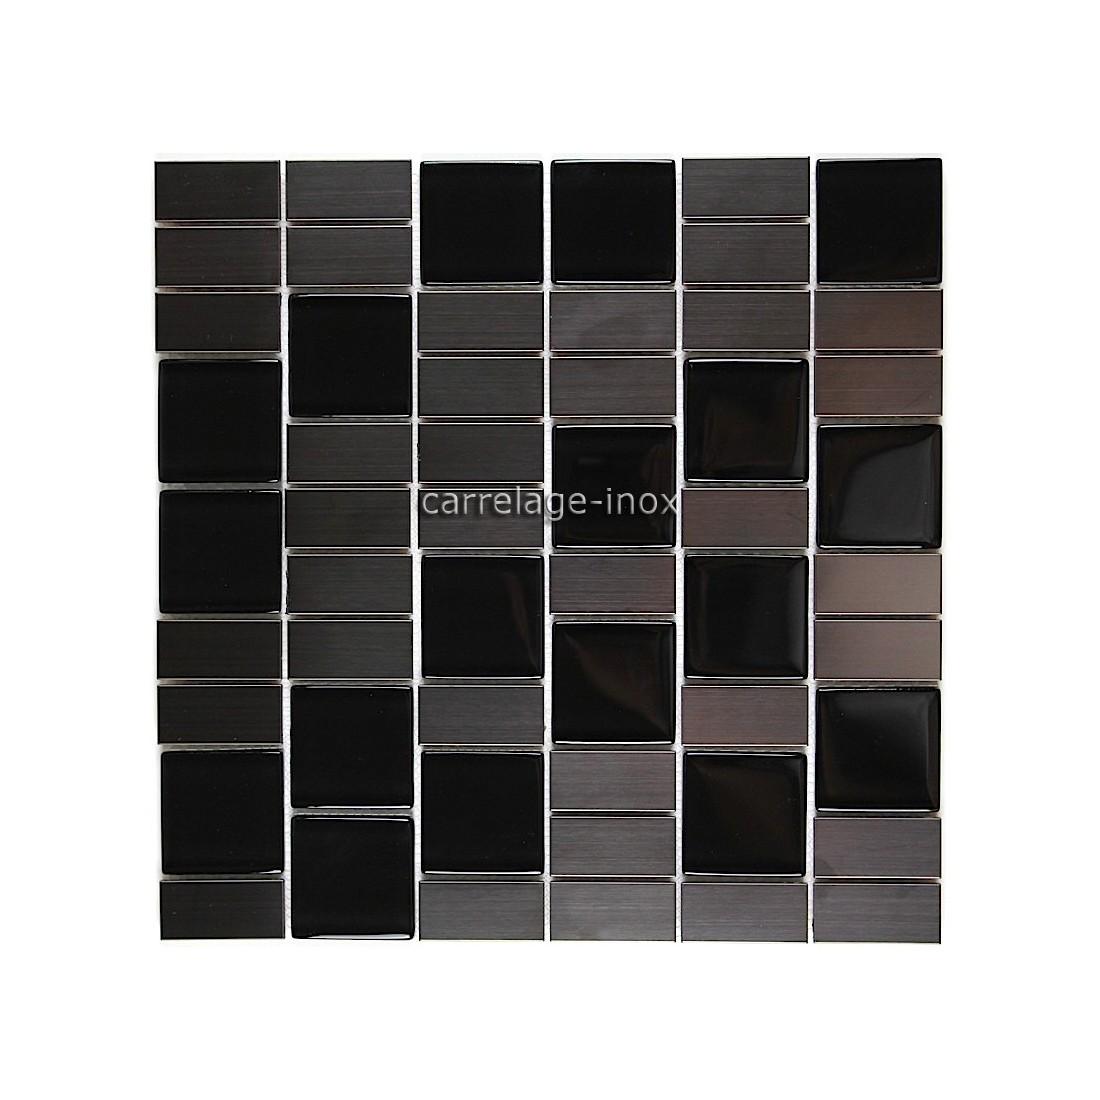 mosaique carrelage inox verre noir 1 m2 modulo. Black Bedroom Furniture Sets. Home Design Ideas